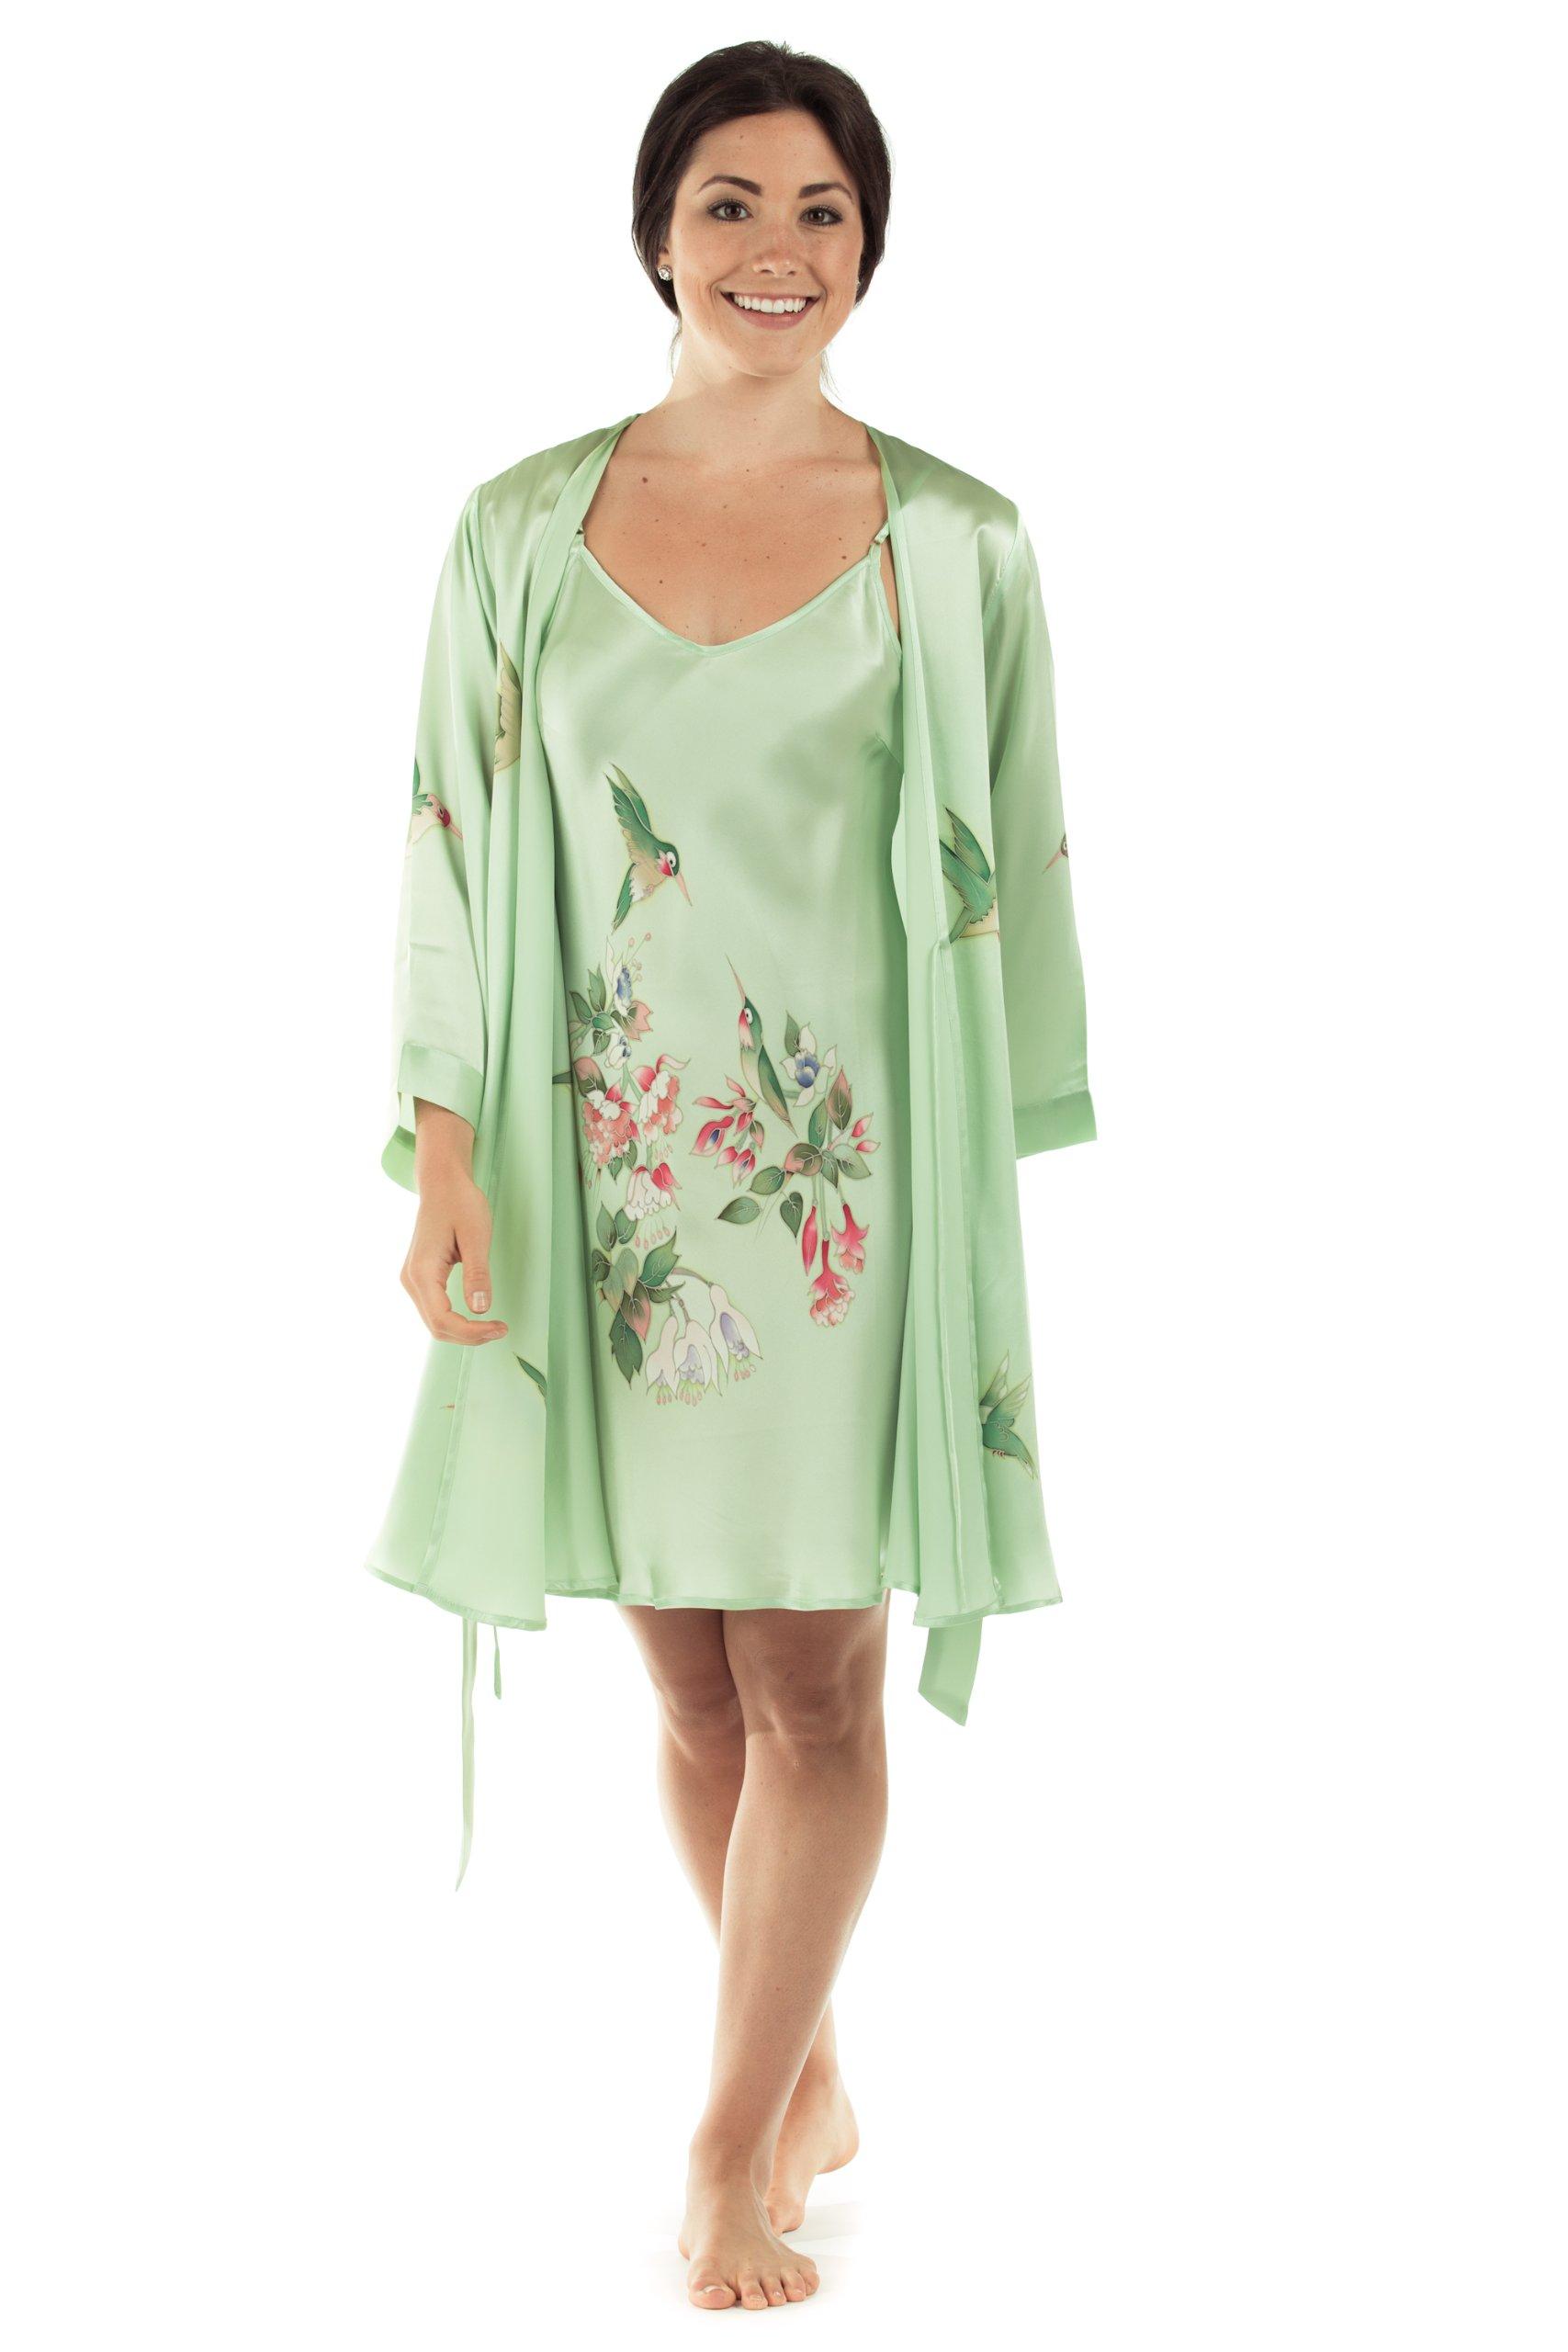 TexereSilk Silk Nightgown Robe Set (Celadon Green, Large) Holiday Gift Ideas WS0602-CDN-L